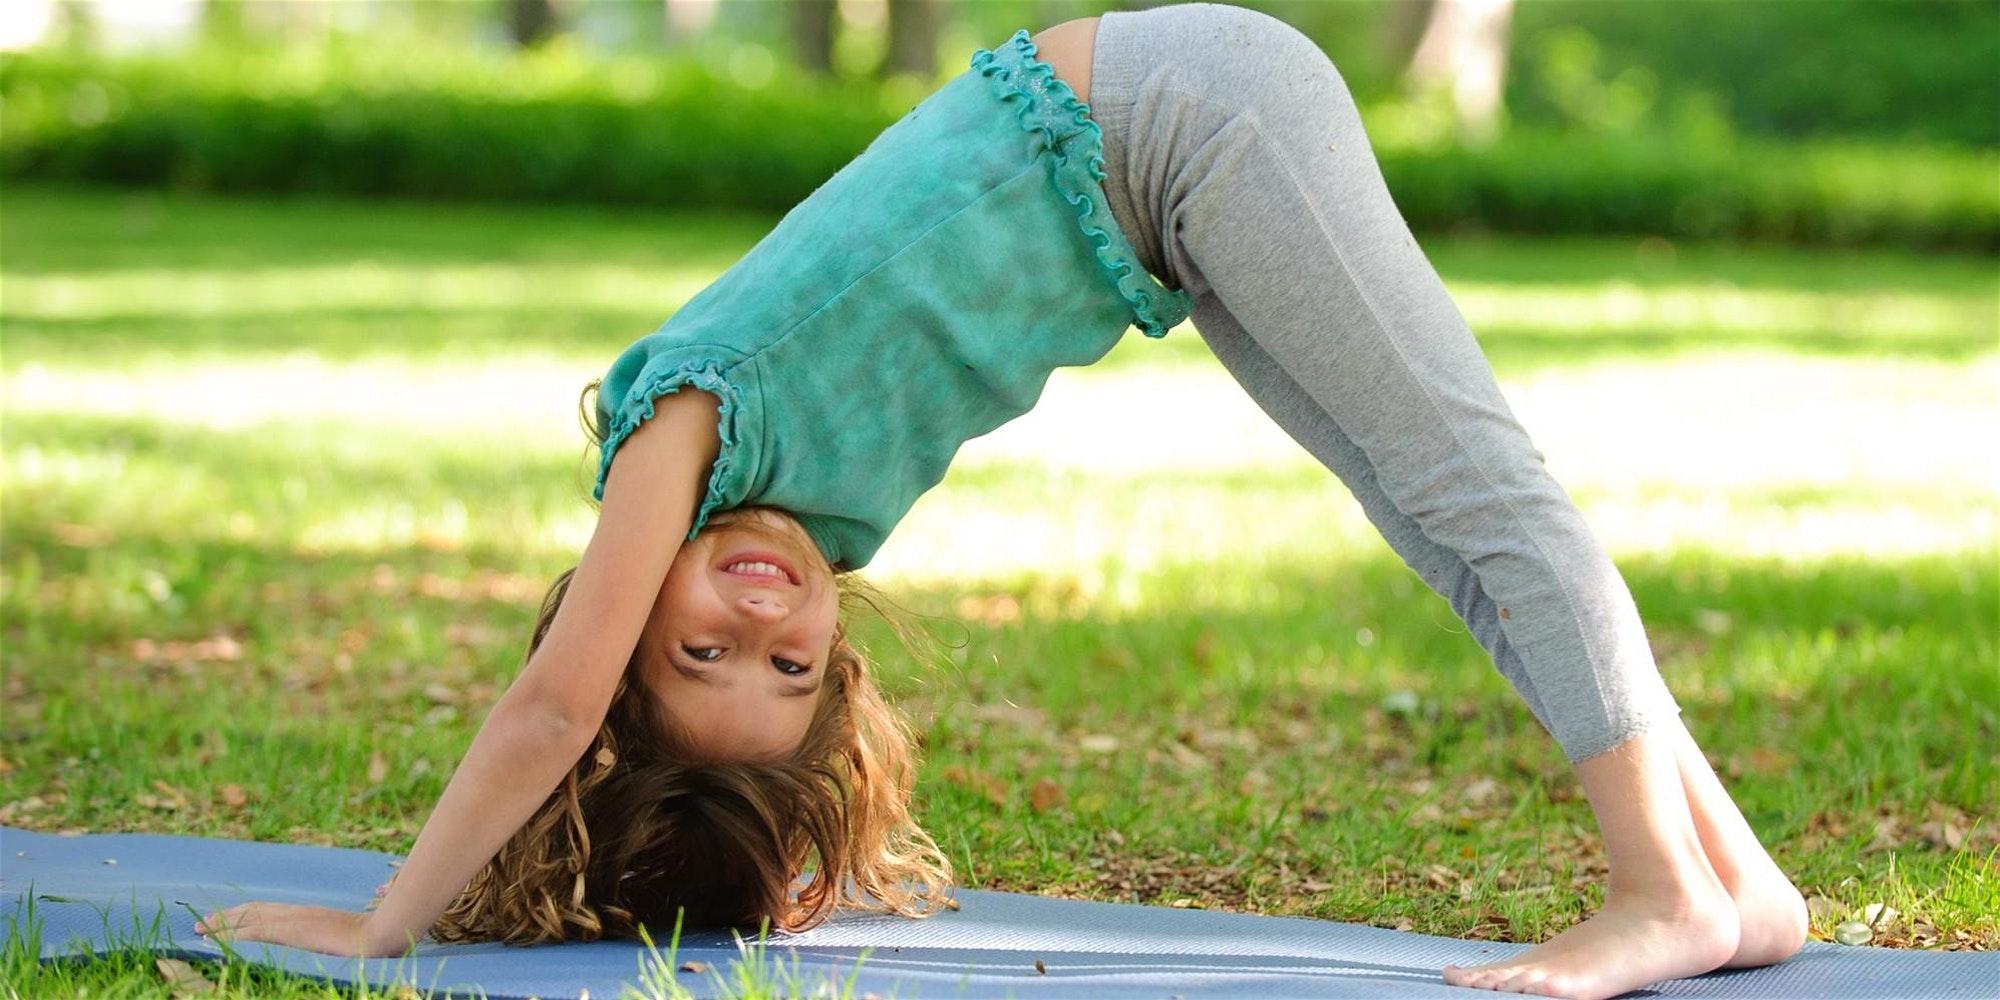 Promo image of Free Kids Yoga Class + Field Day